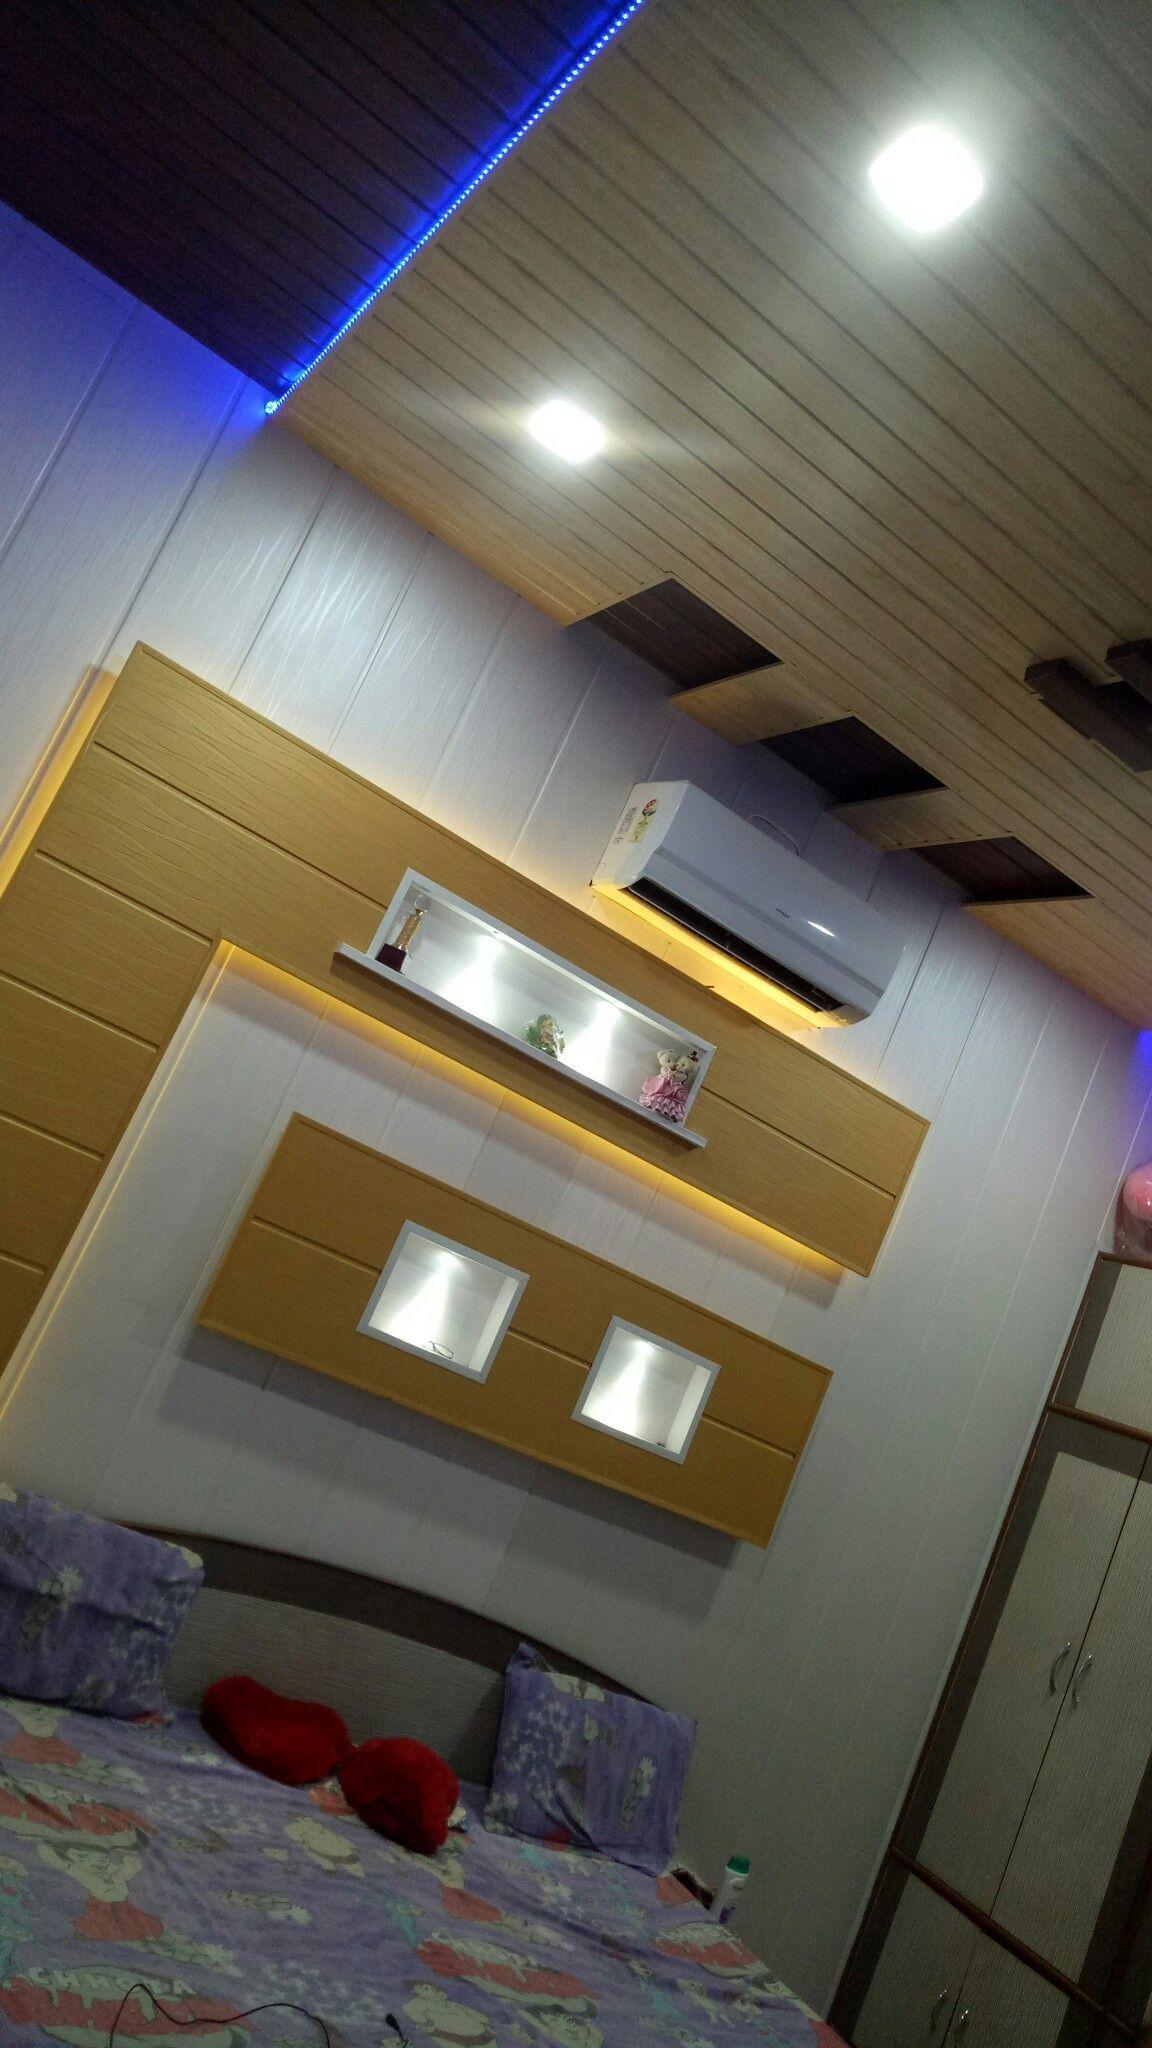 Pvc Wall Panels Living Room Pvc Wall Panels In 2020 Pvc Ceiling Design Ceiling Design Bedroom Pvc Wall Panels Bedroom design ideas pvc